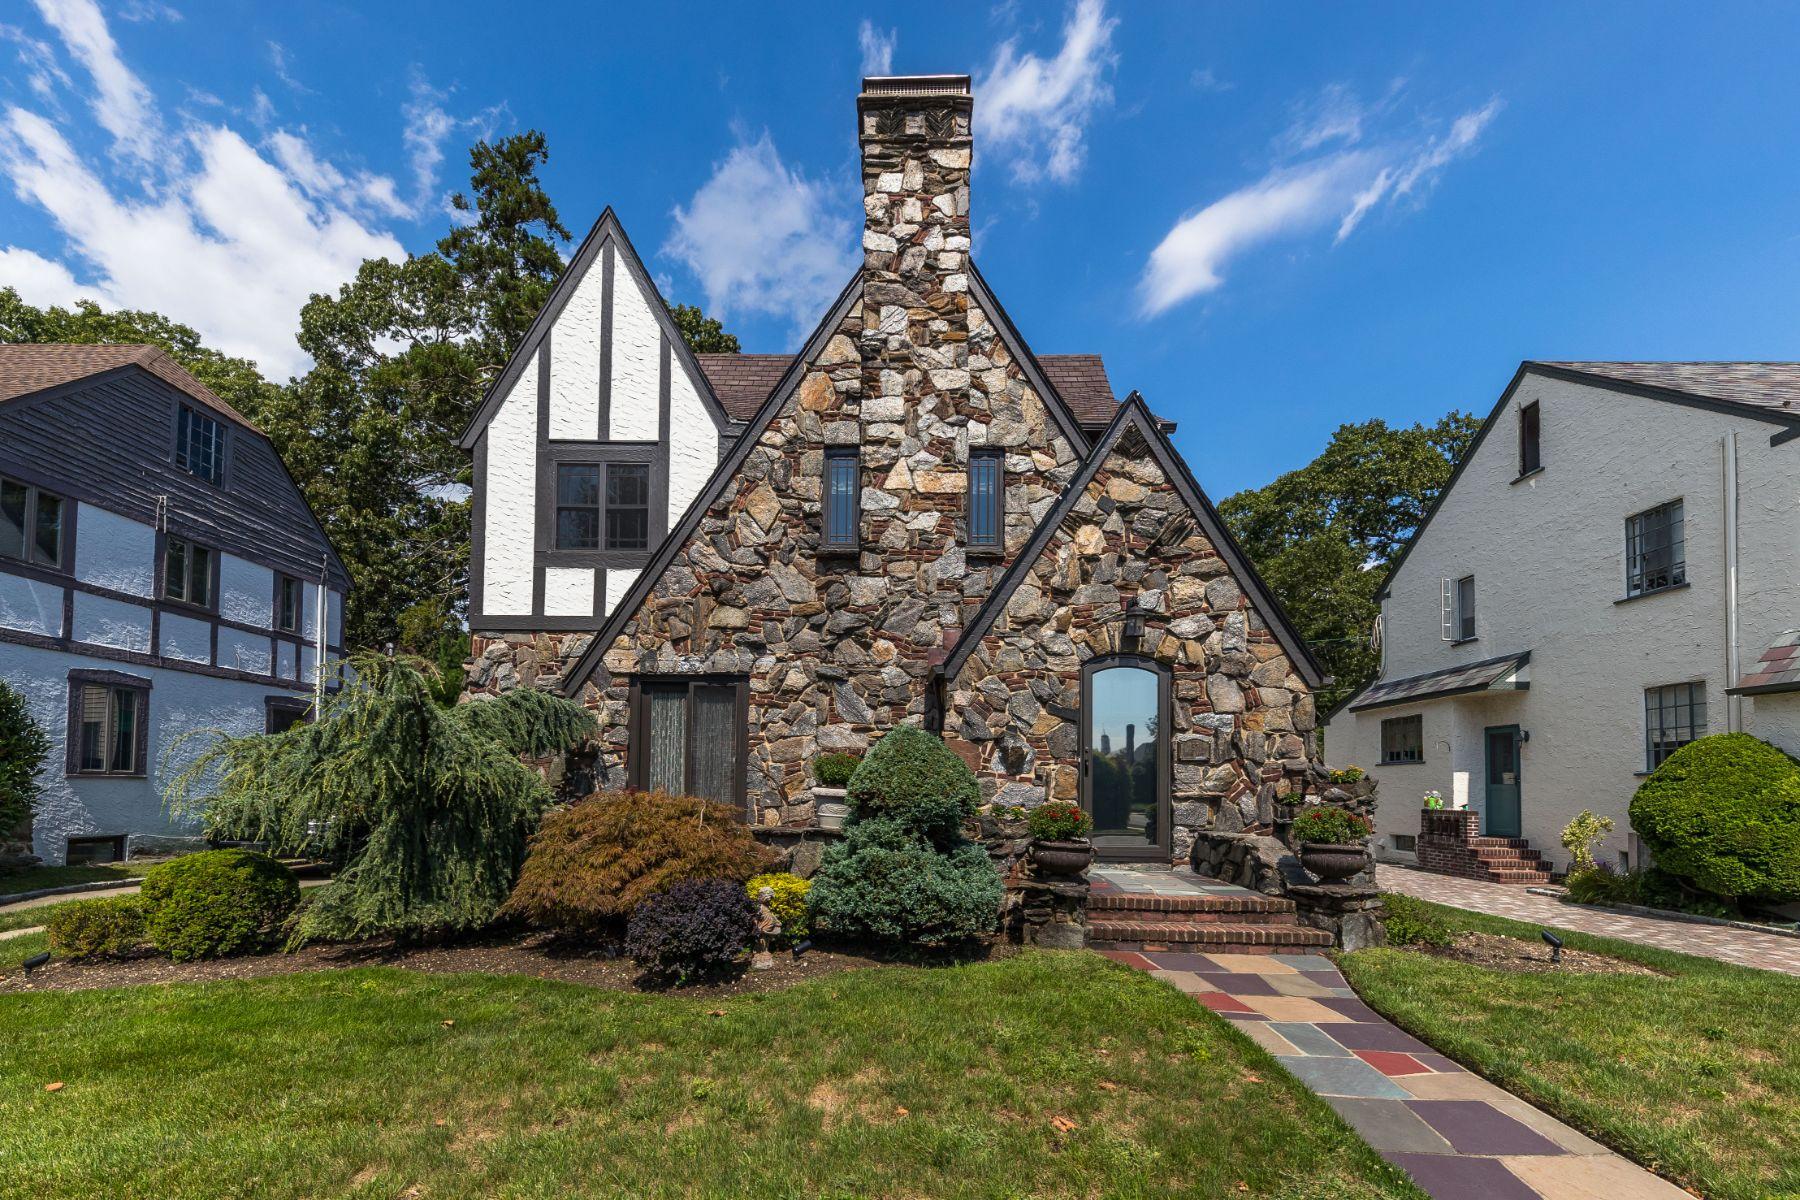 Single Family Homes for Sale at Rockville Centre 57 Park Ln Rockville Centre, New York 11570 United States